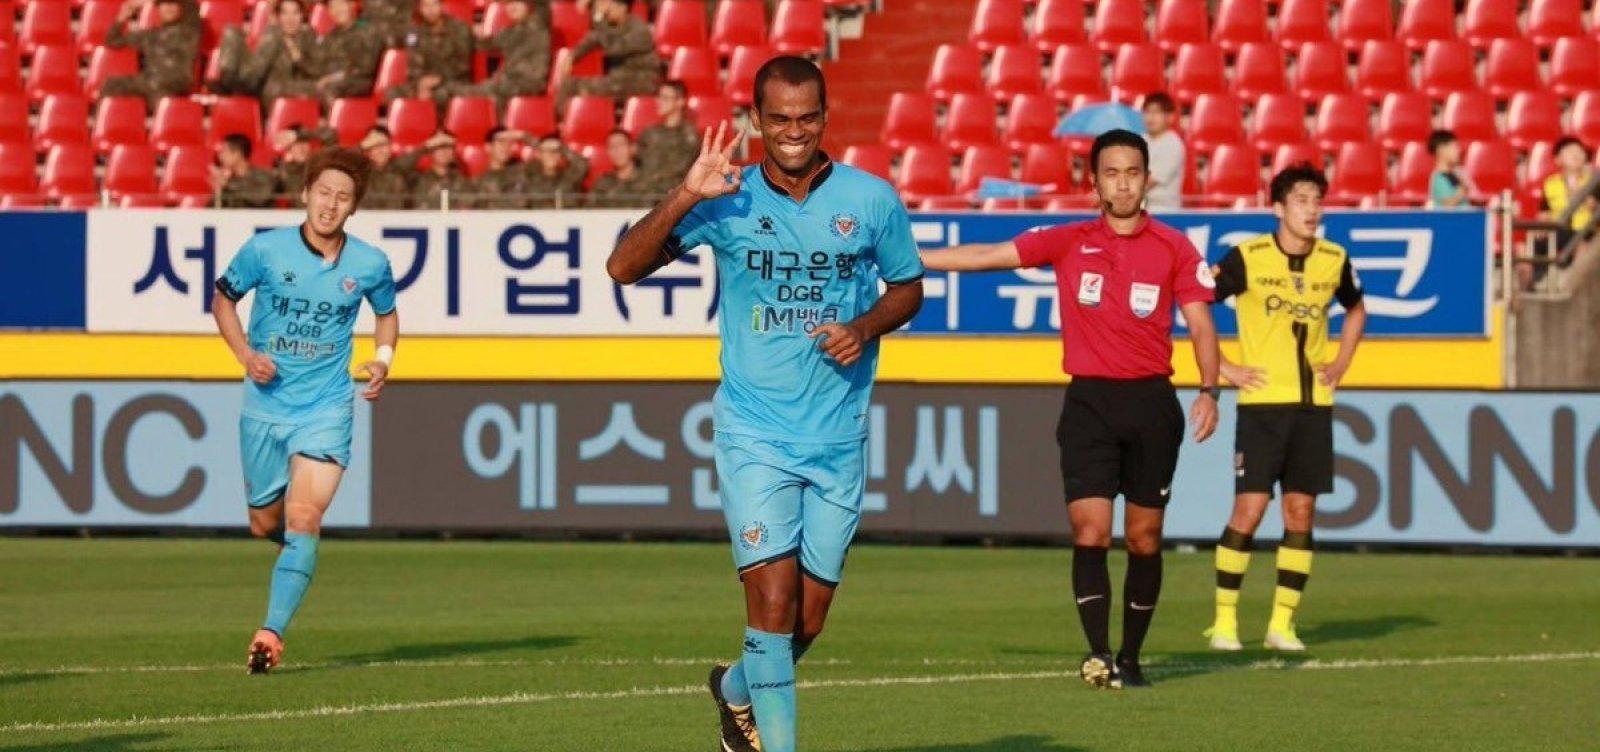 [Atacante baiano é maior artilheiro do futebol sul-coreano pelo segundo ano consecutivo]